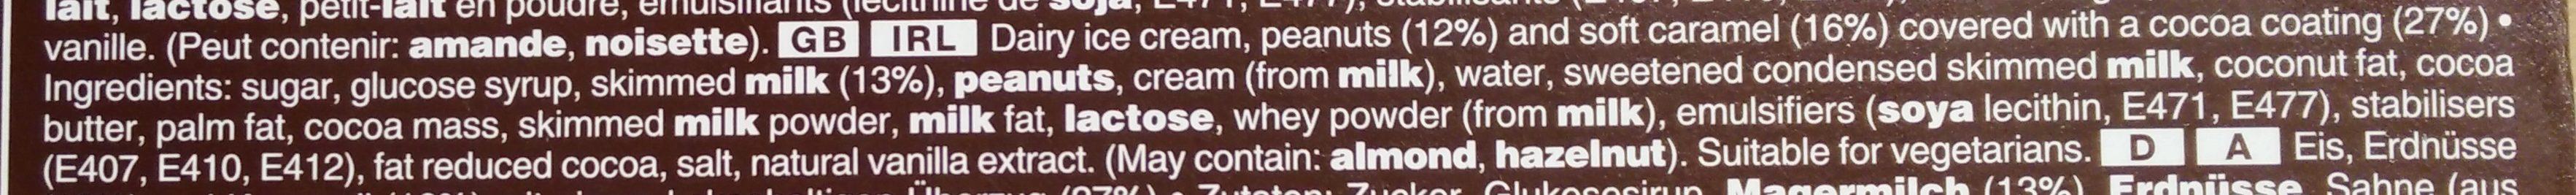 Snickers Ice Cream - Ingredients